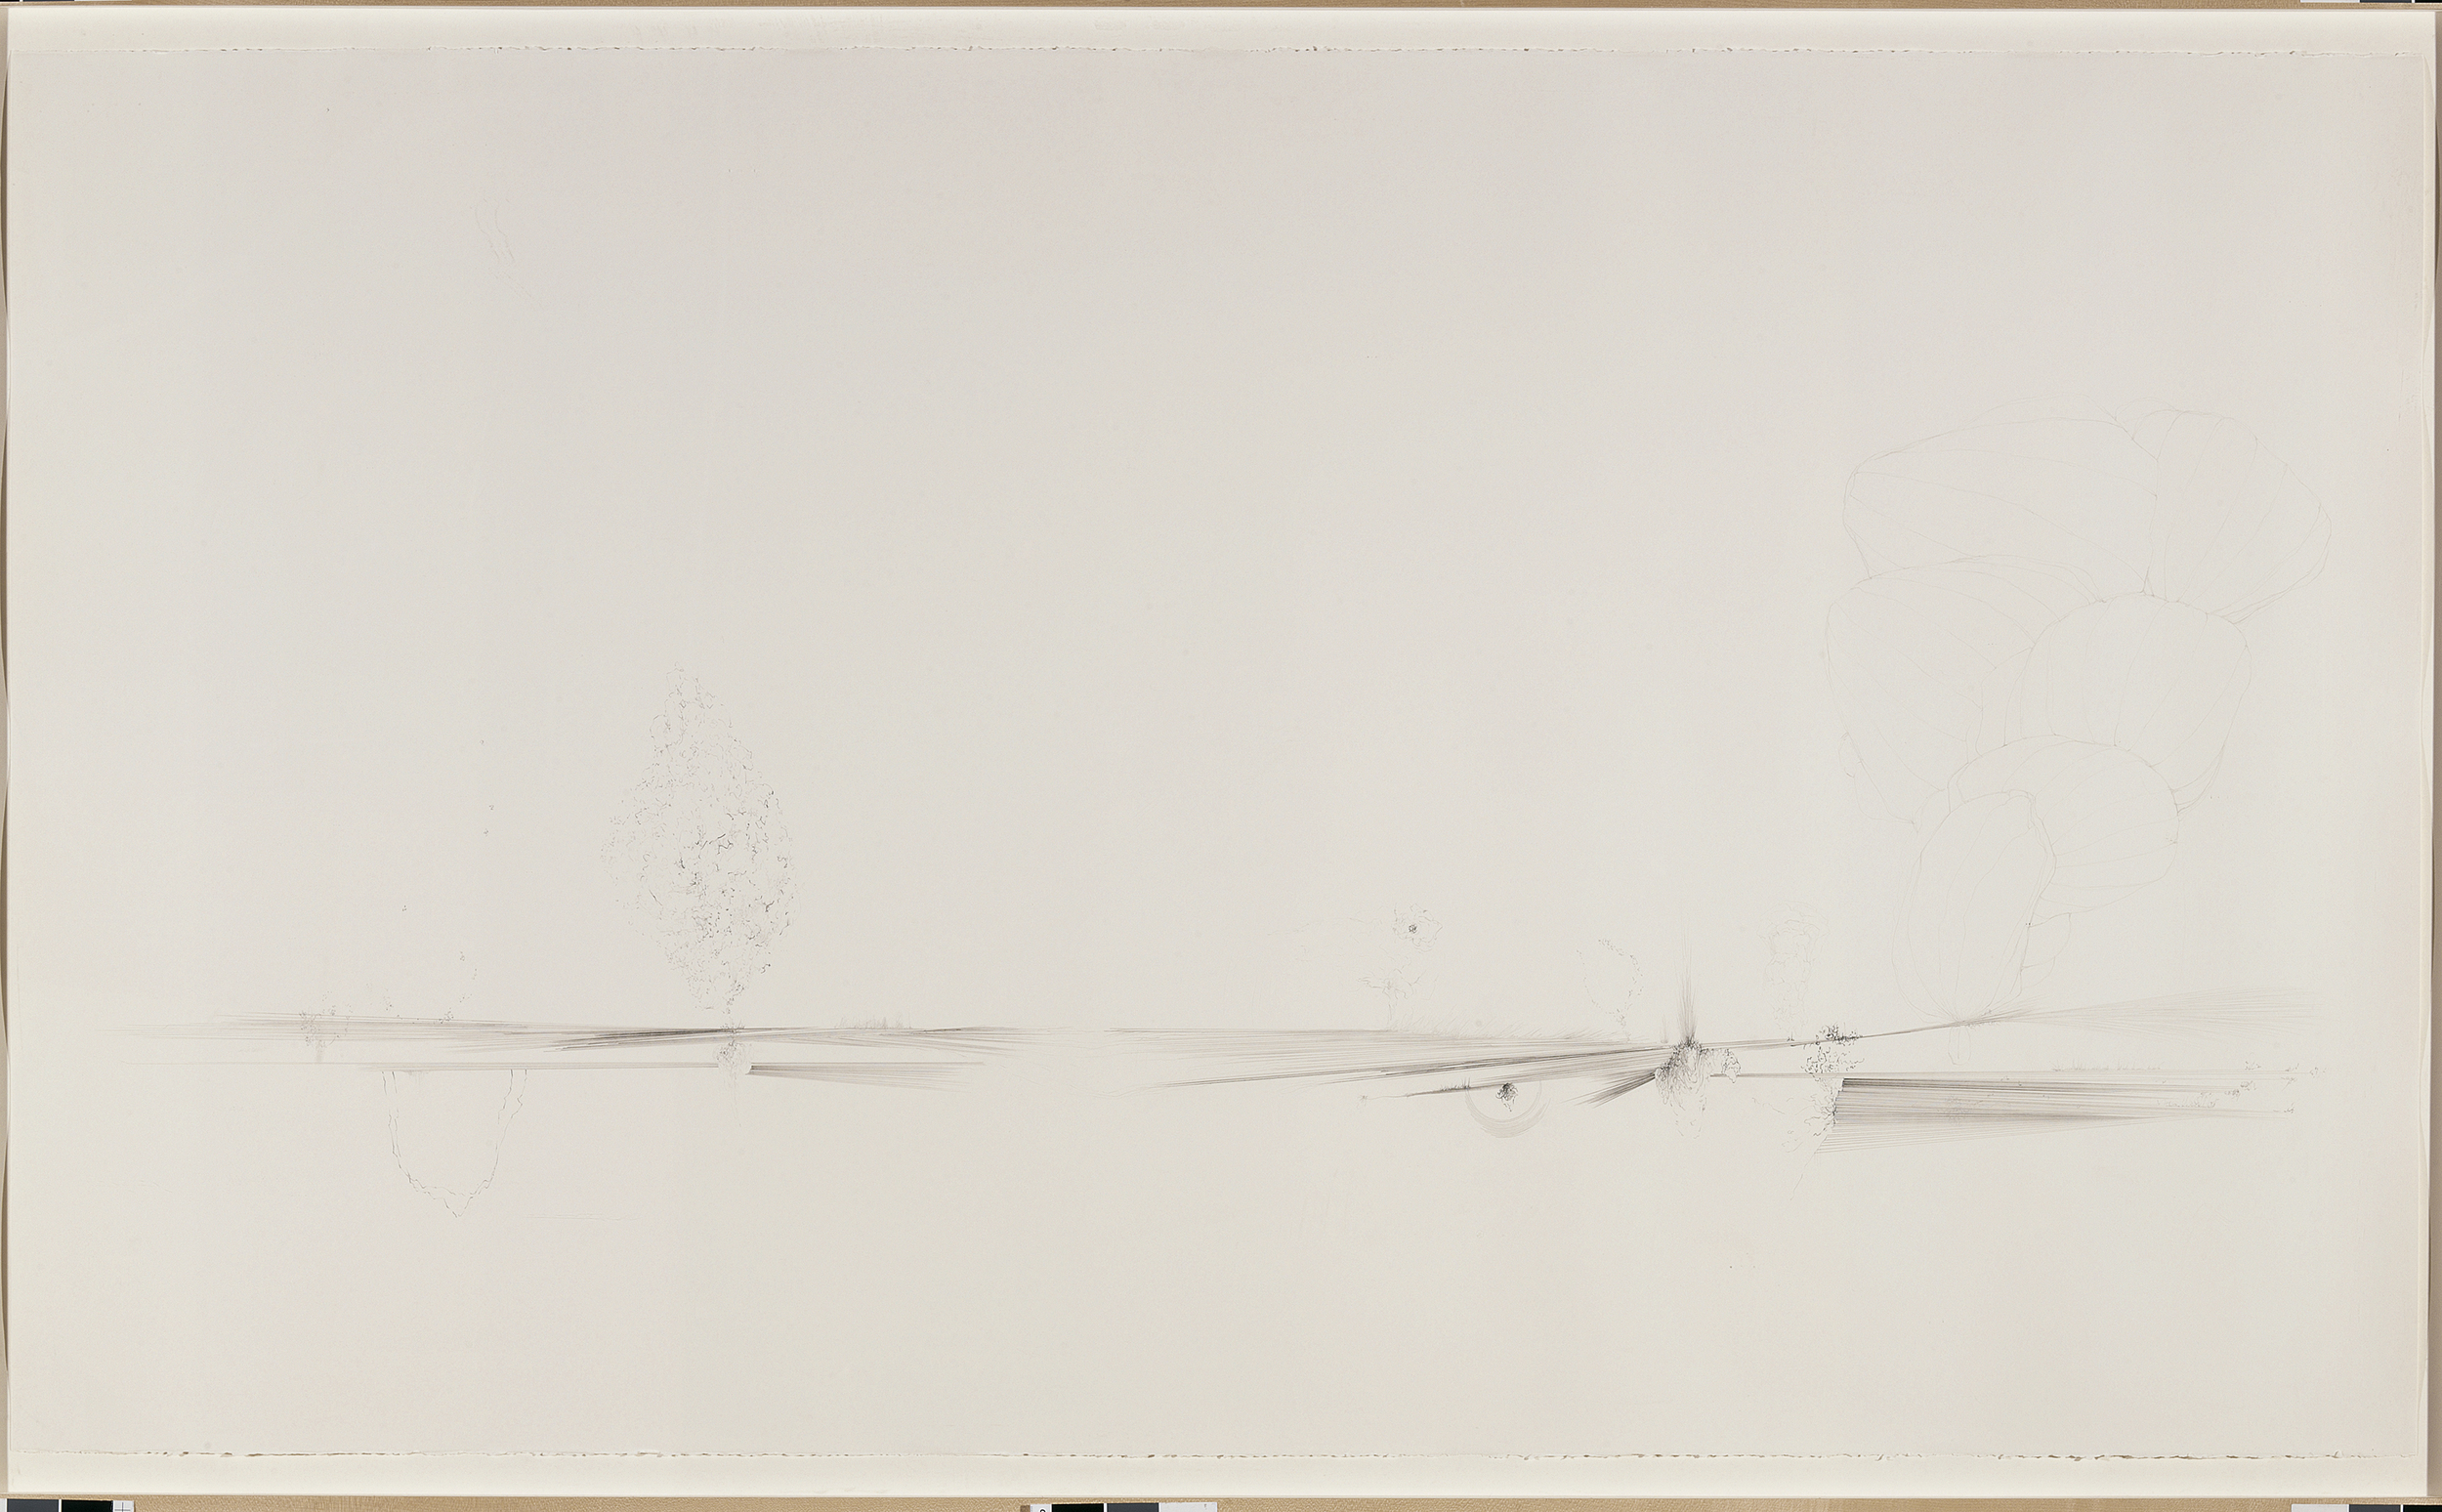 Fissures & Acorns, 2005, 76 in. long